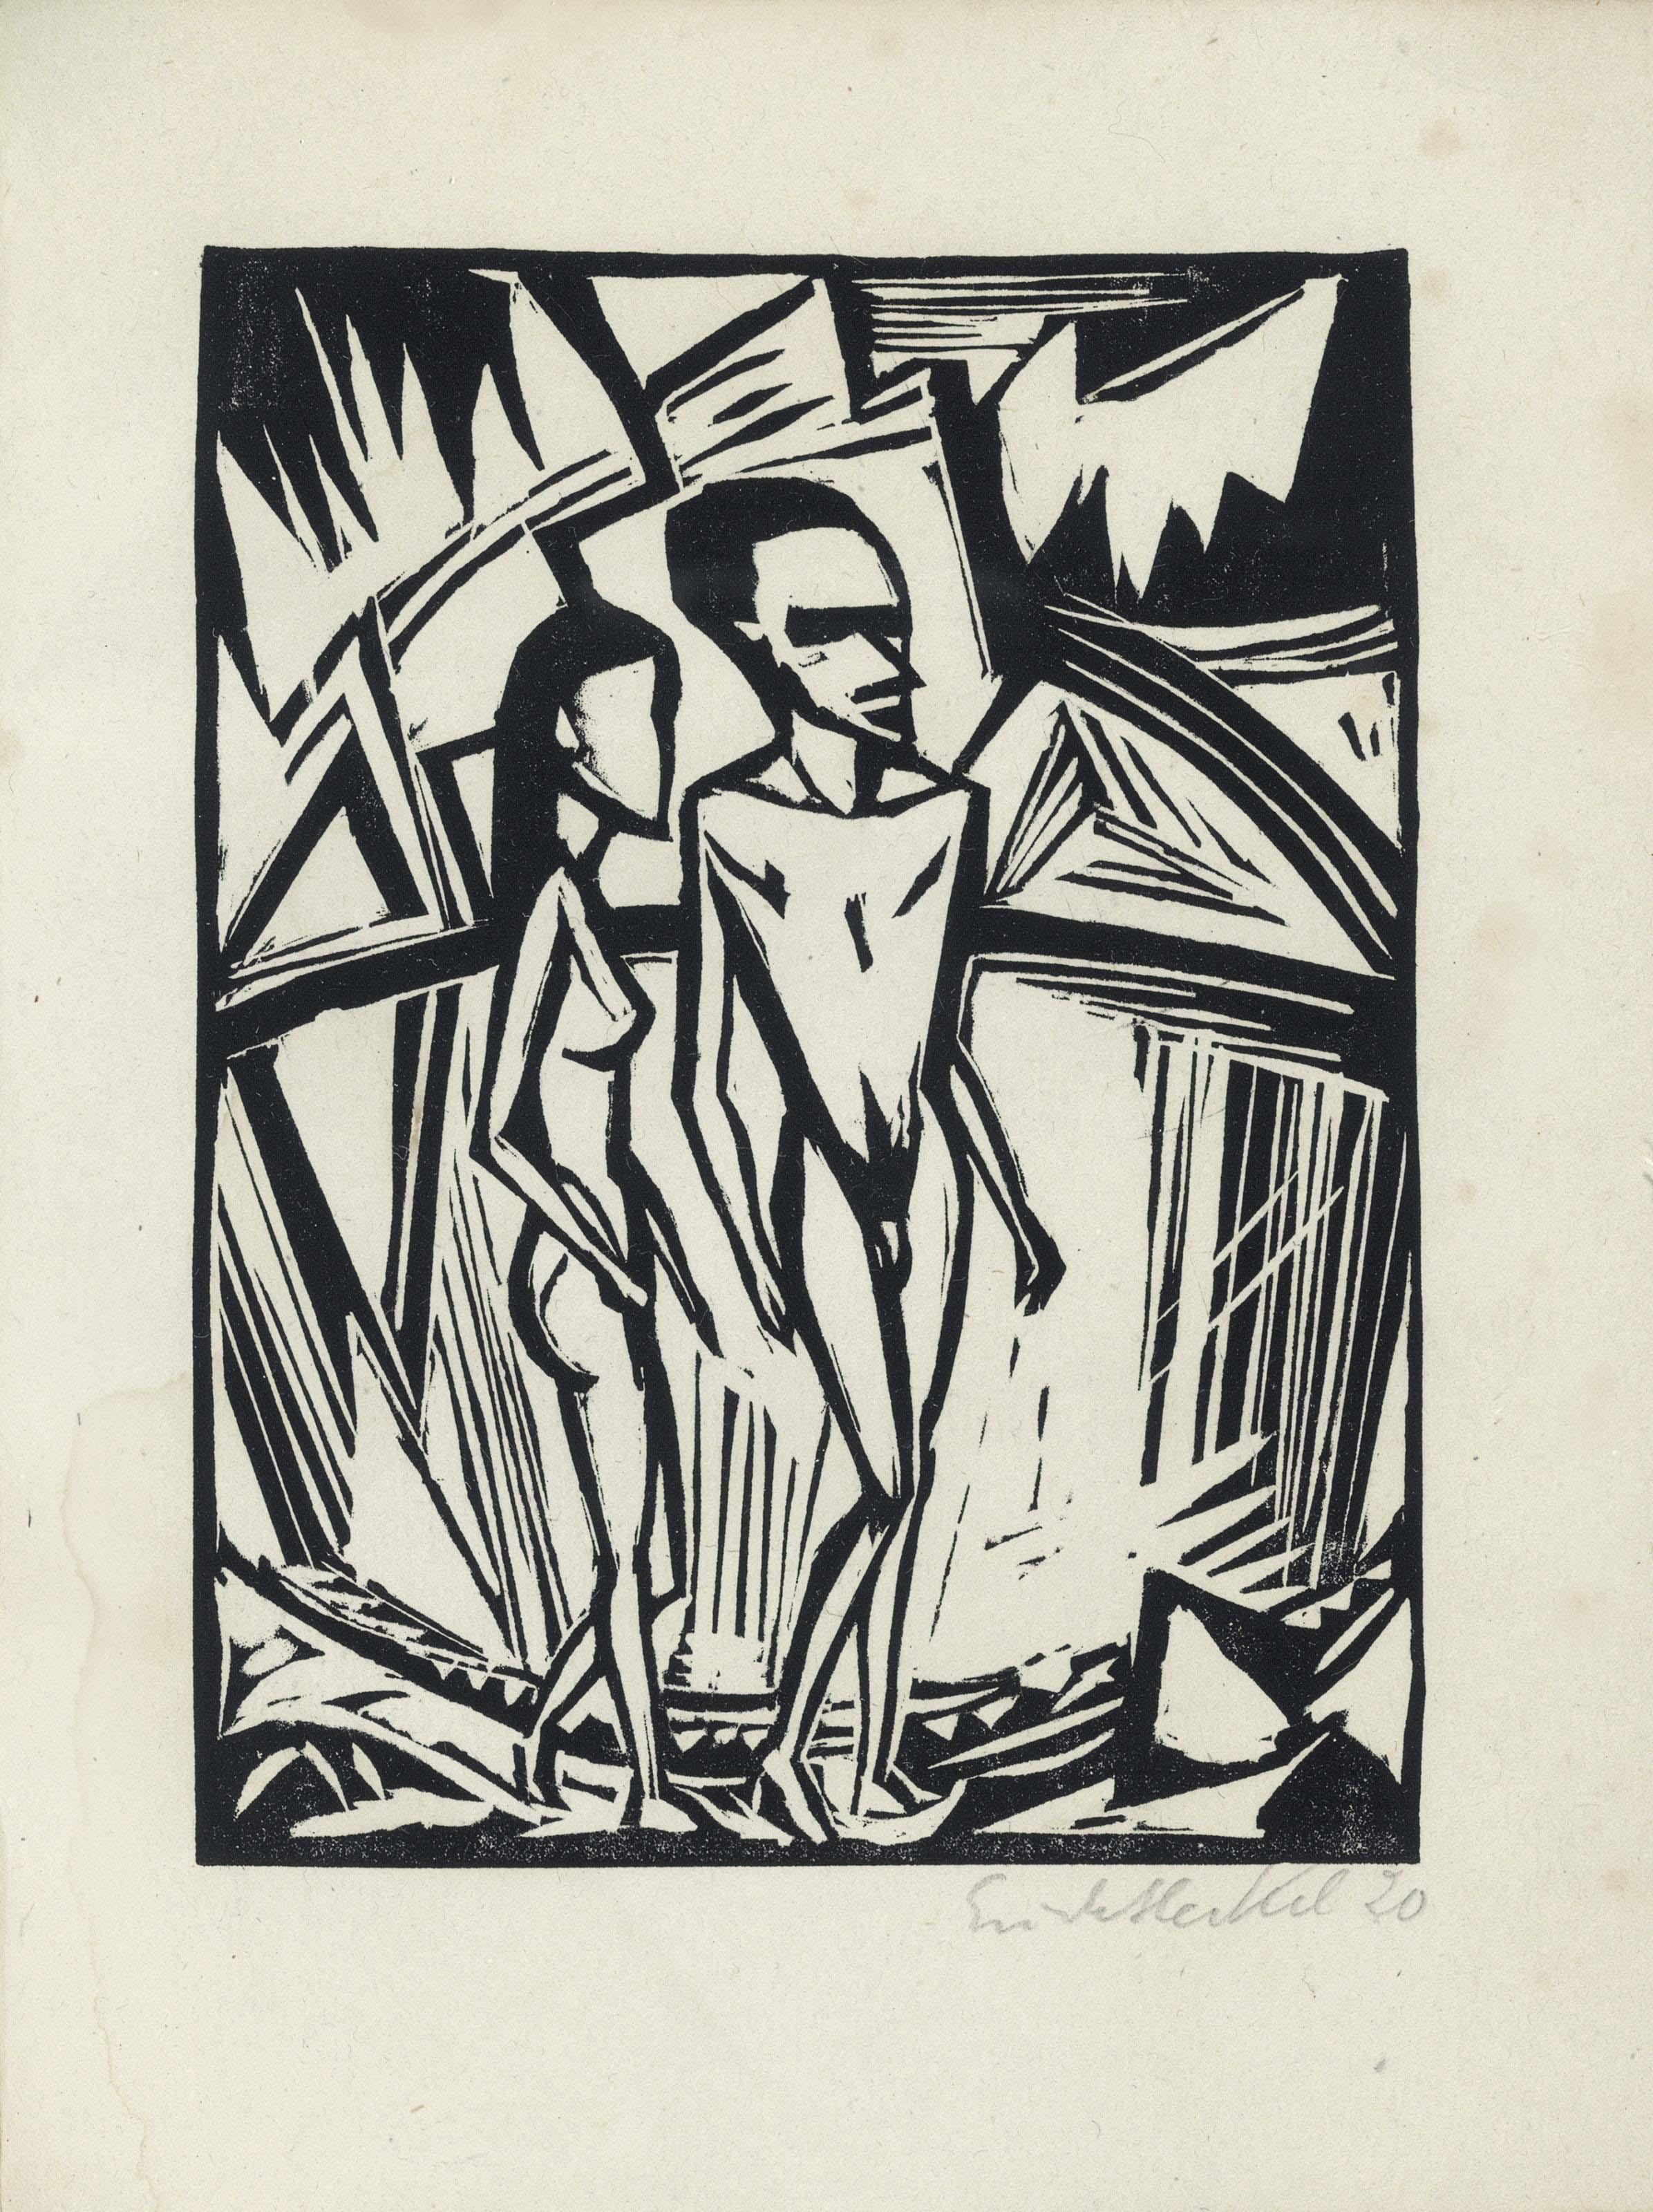 WESTHEIM, Paul (1886-1963). Da